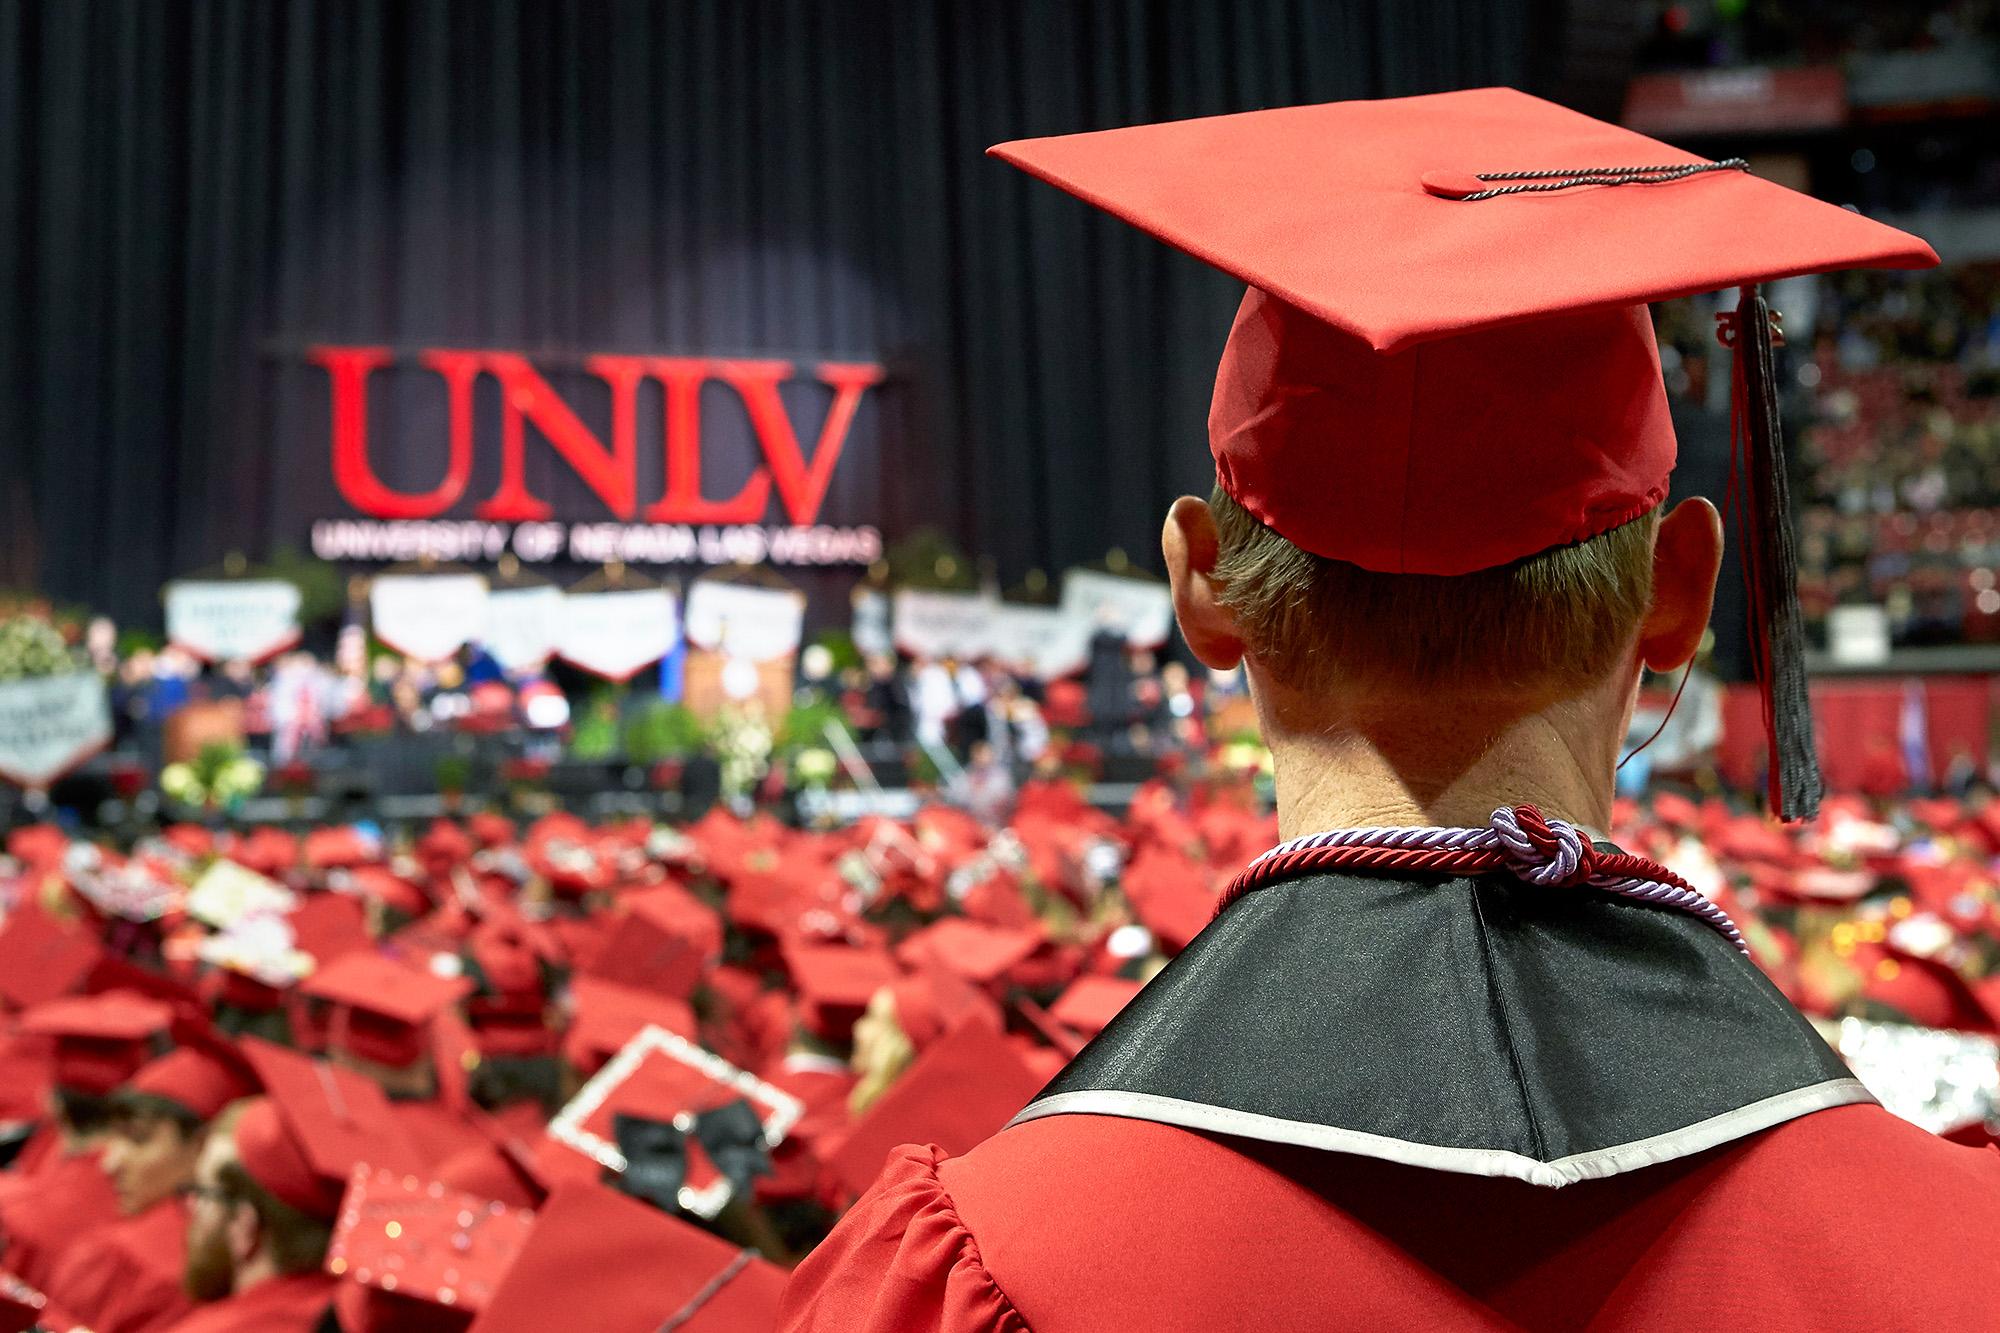 Unlv Live Stream Graduation   Homestylesite.co